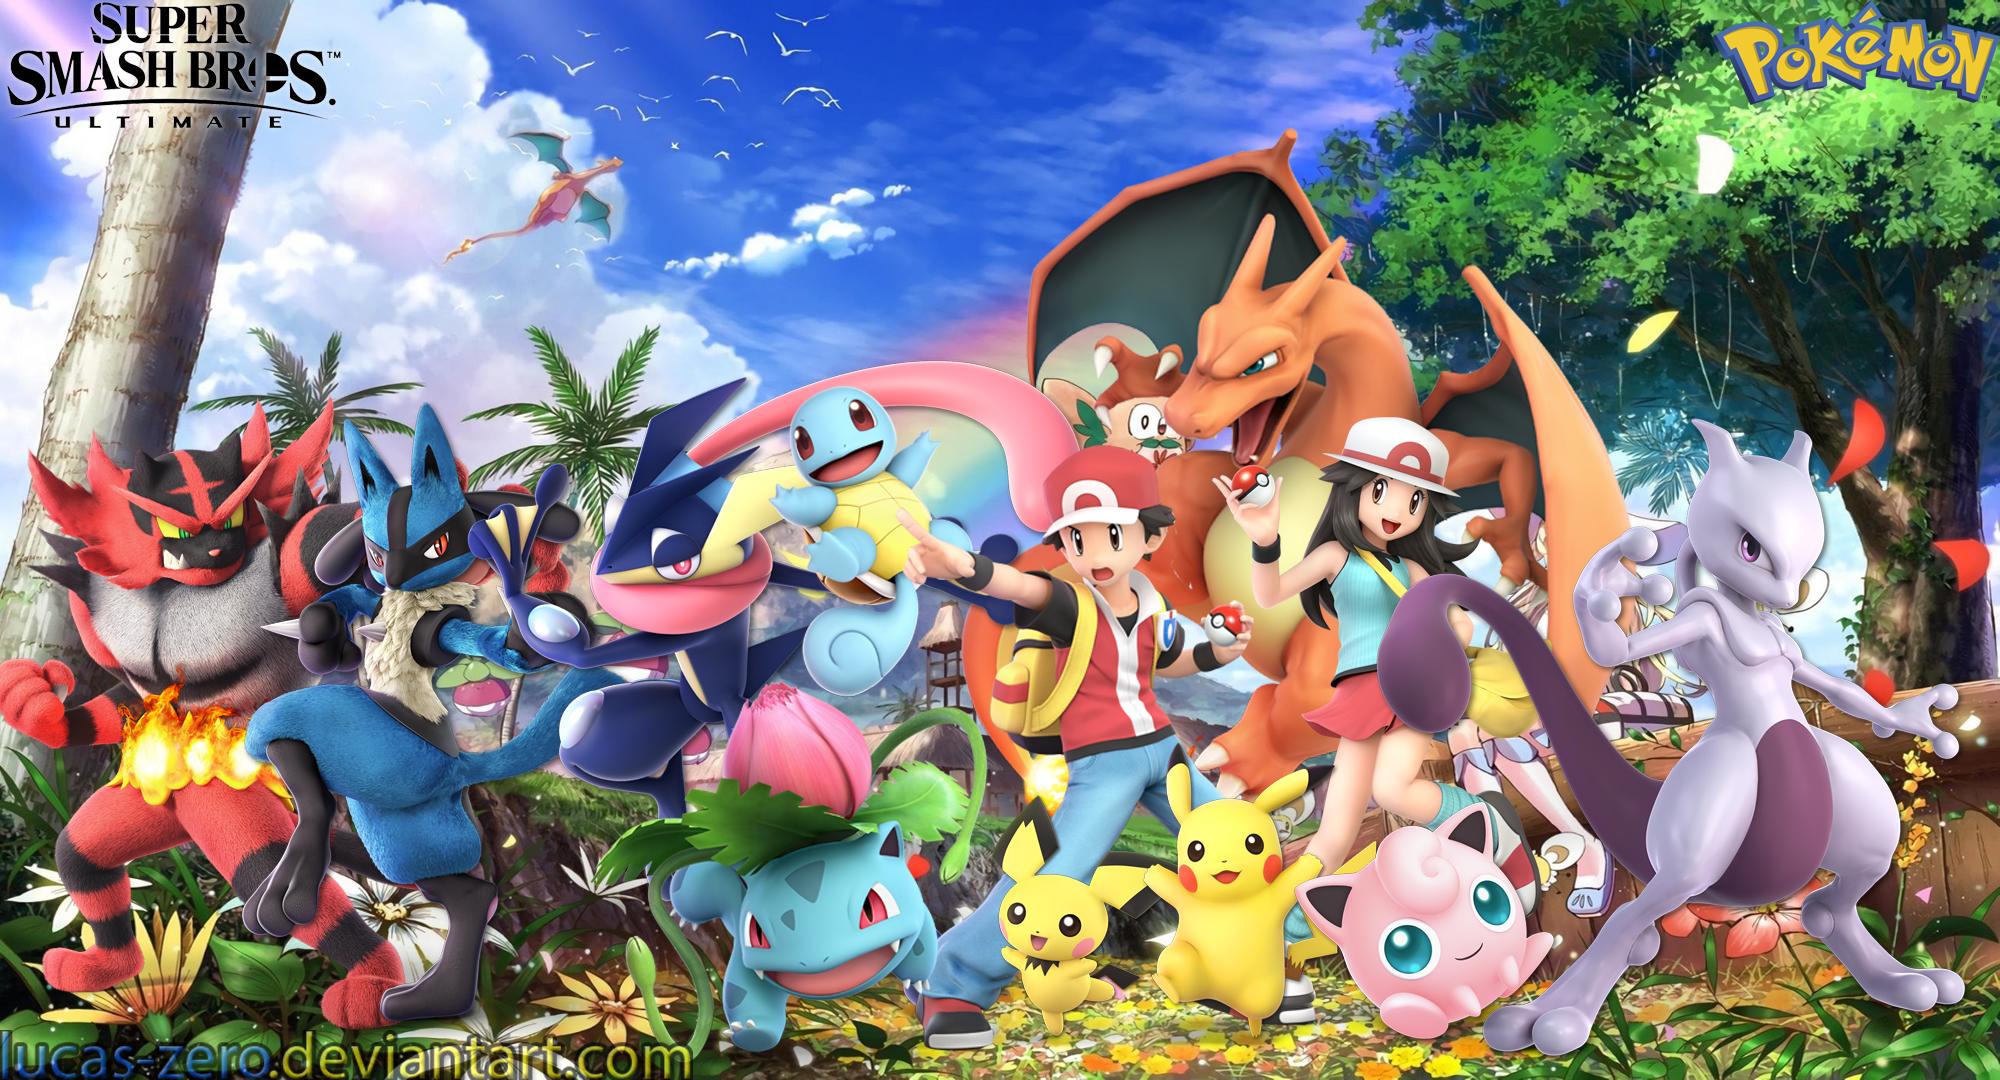 Pokemon Super Smash Bros Ultimate Wallpaper By Lucas Zero On